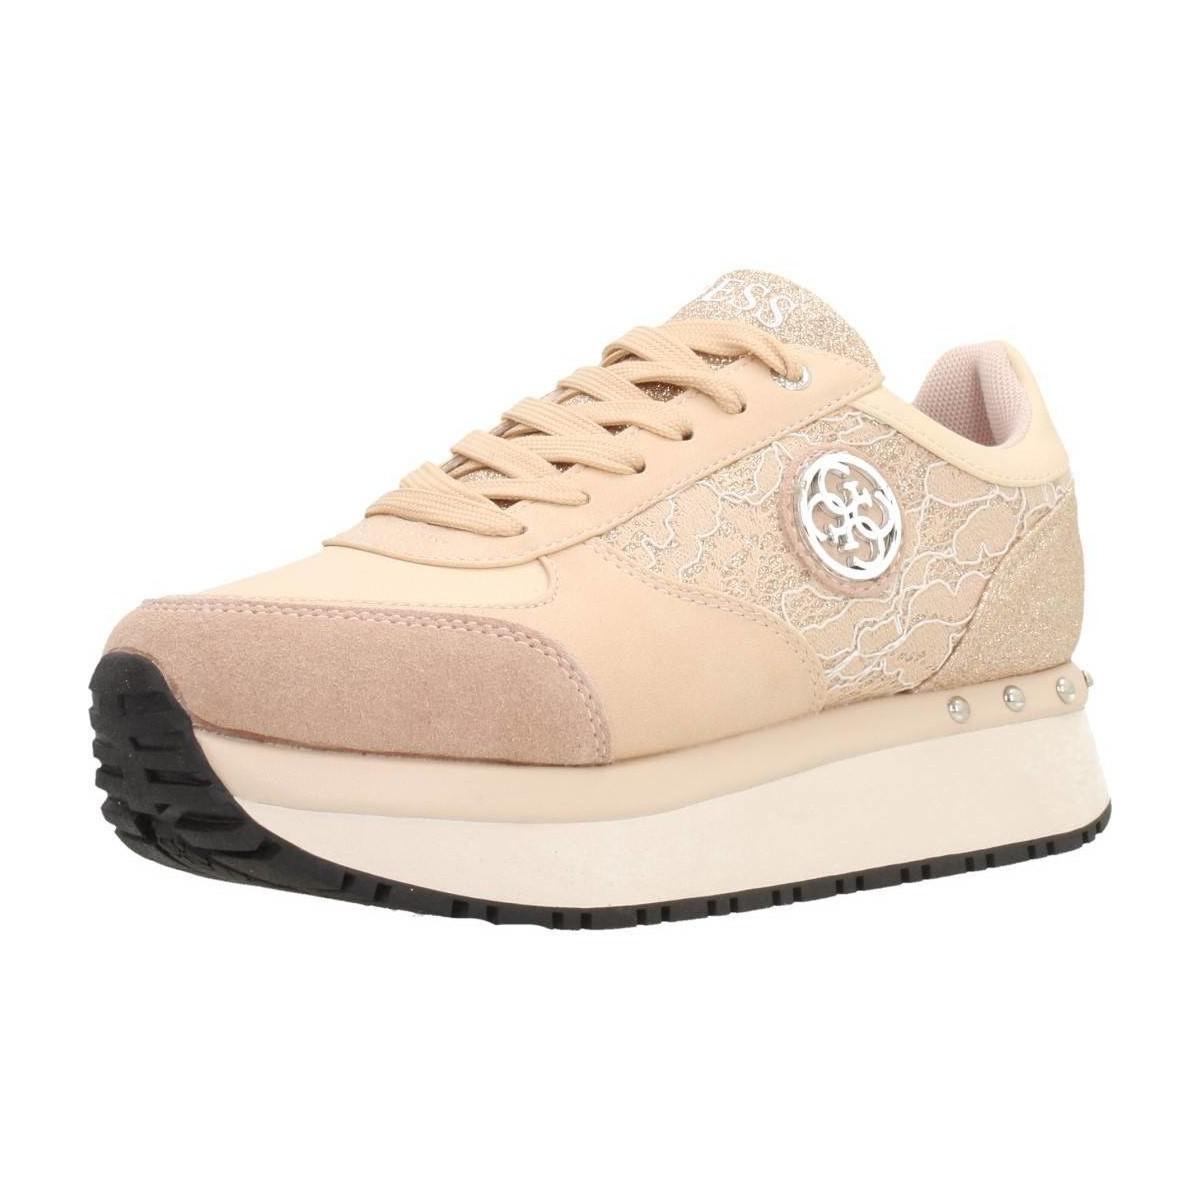 Lyst - Chaussures TIFFANY Guess en coloris Rose f522a5c390bd